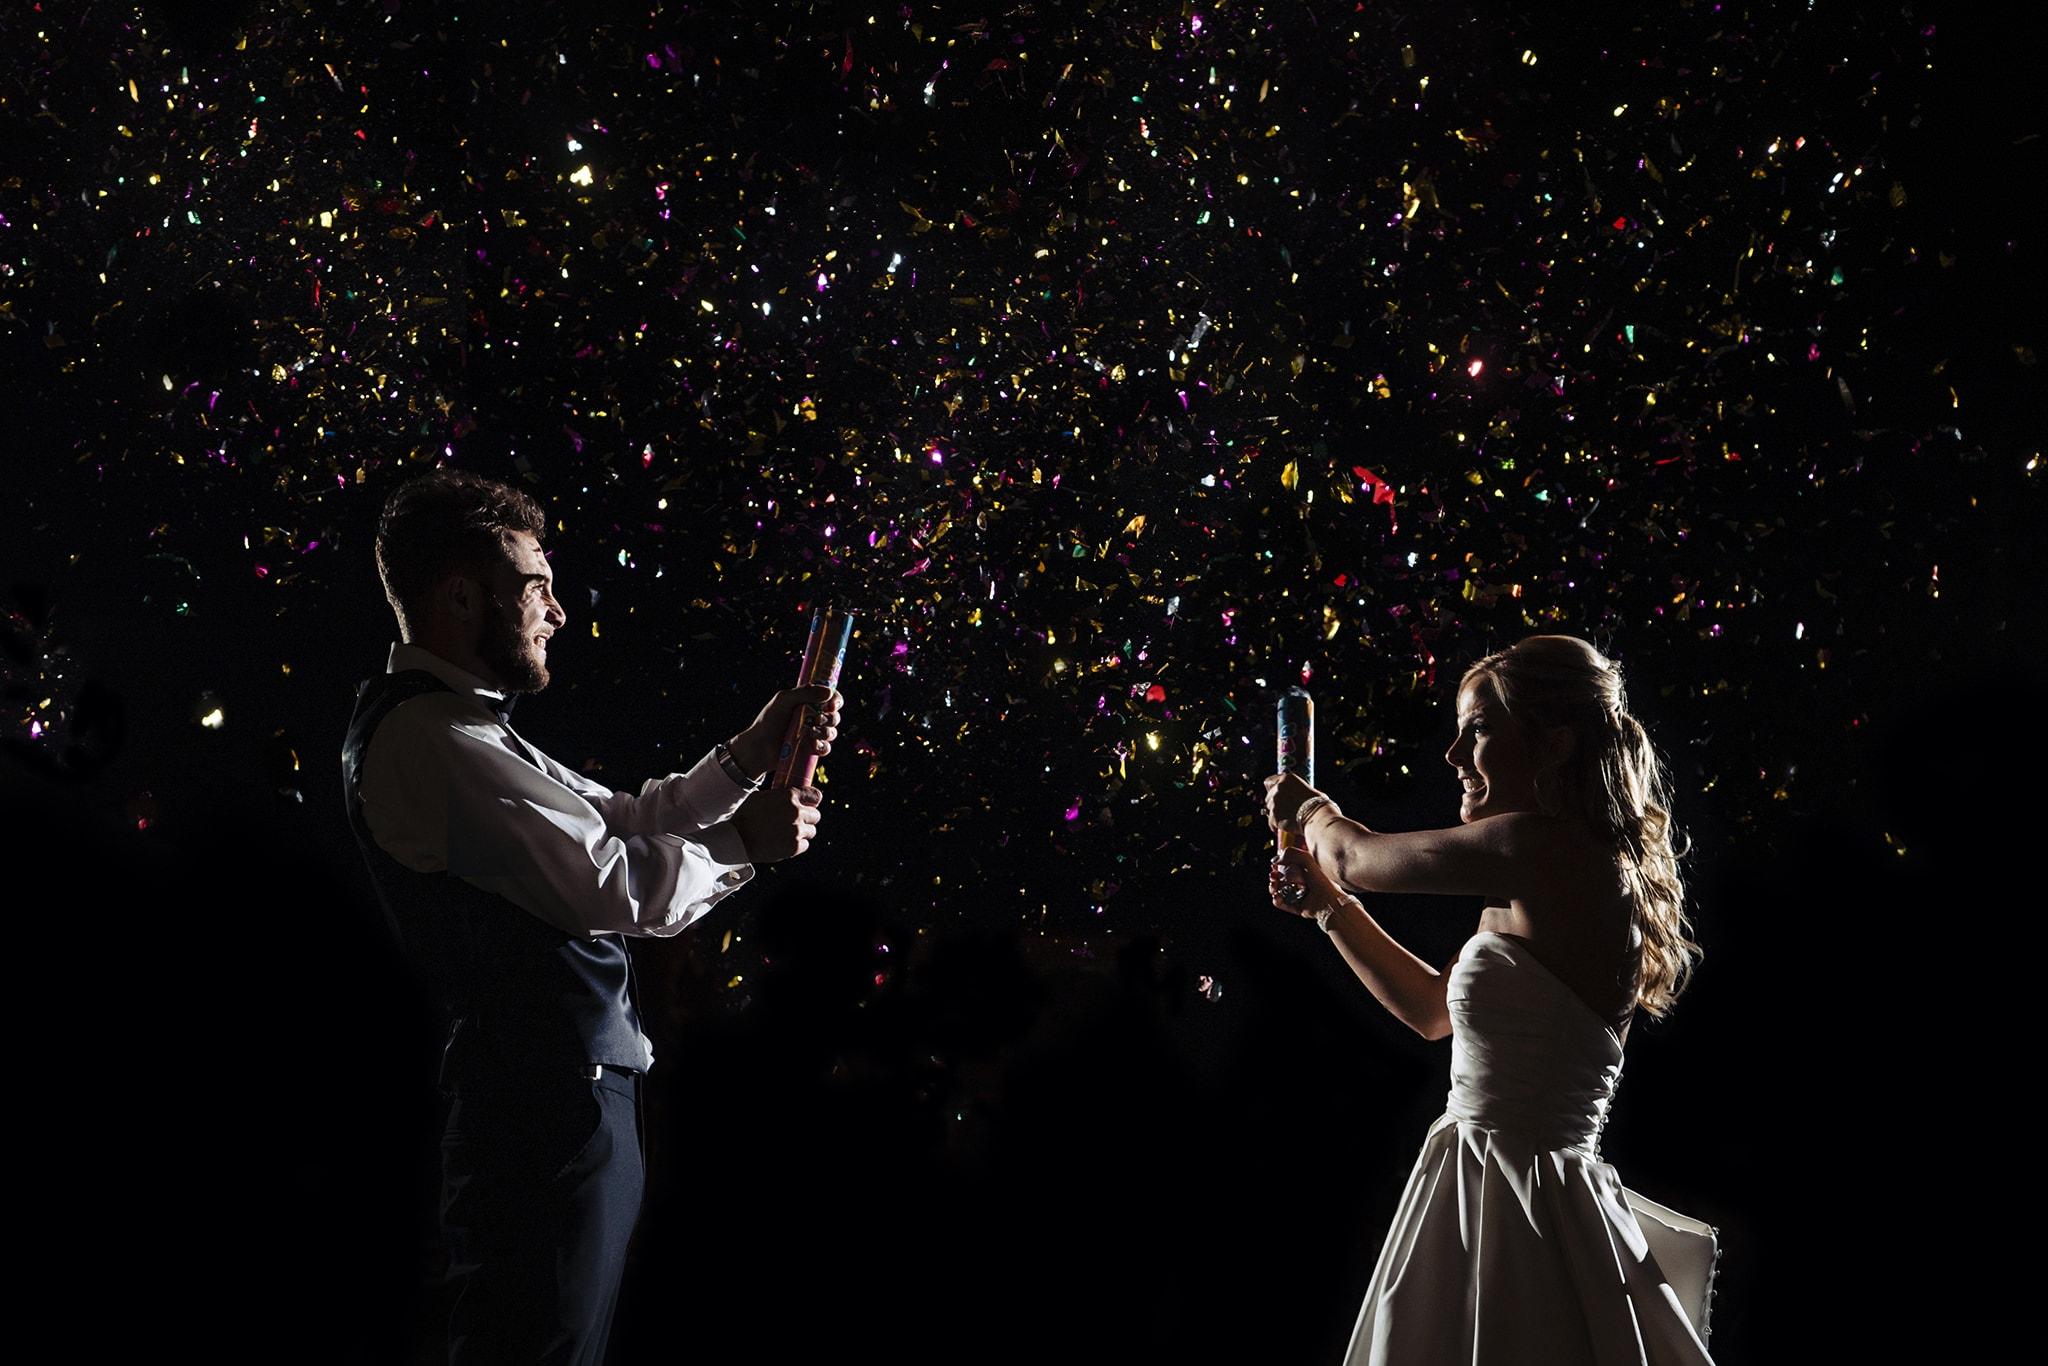 Bride and groom pop confetti